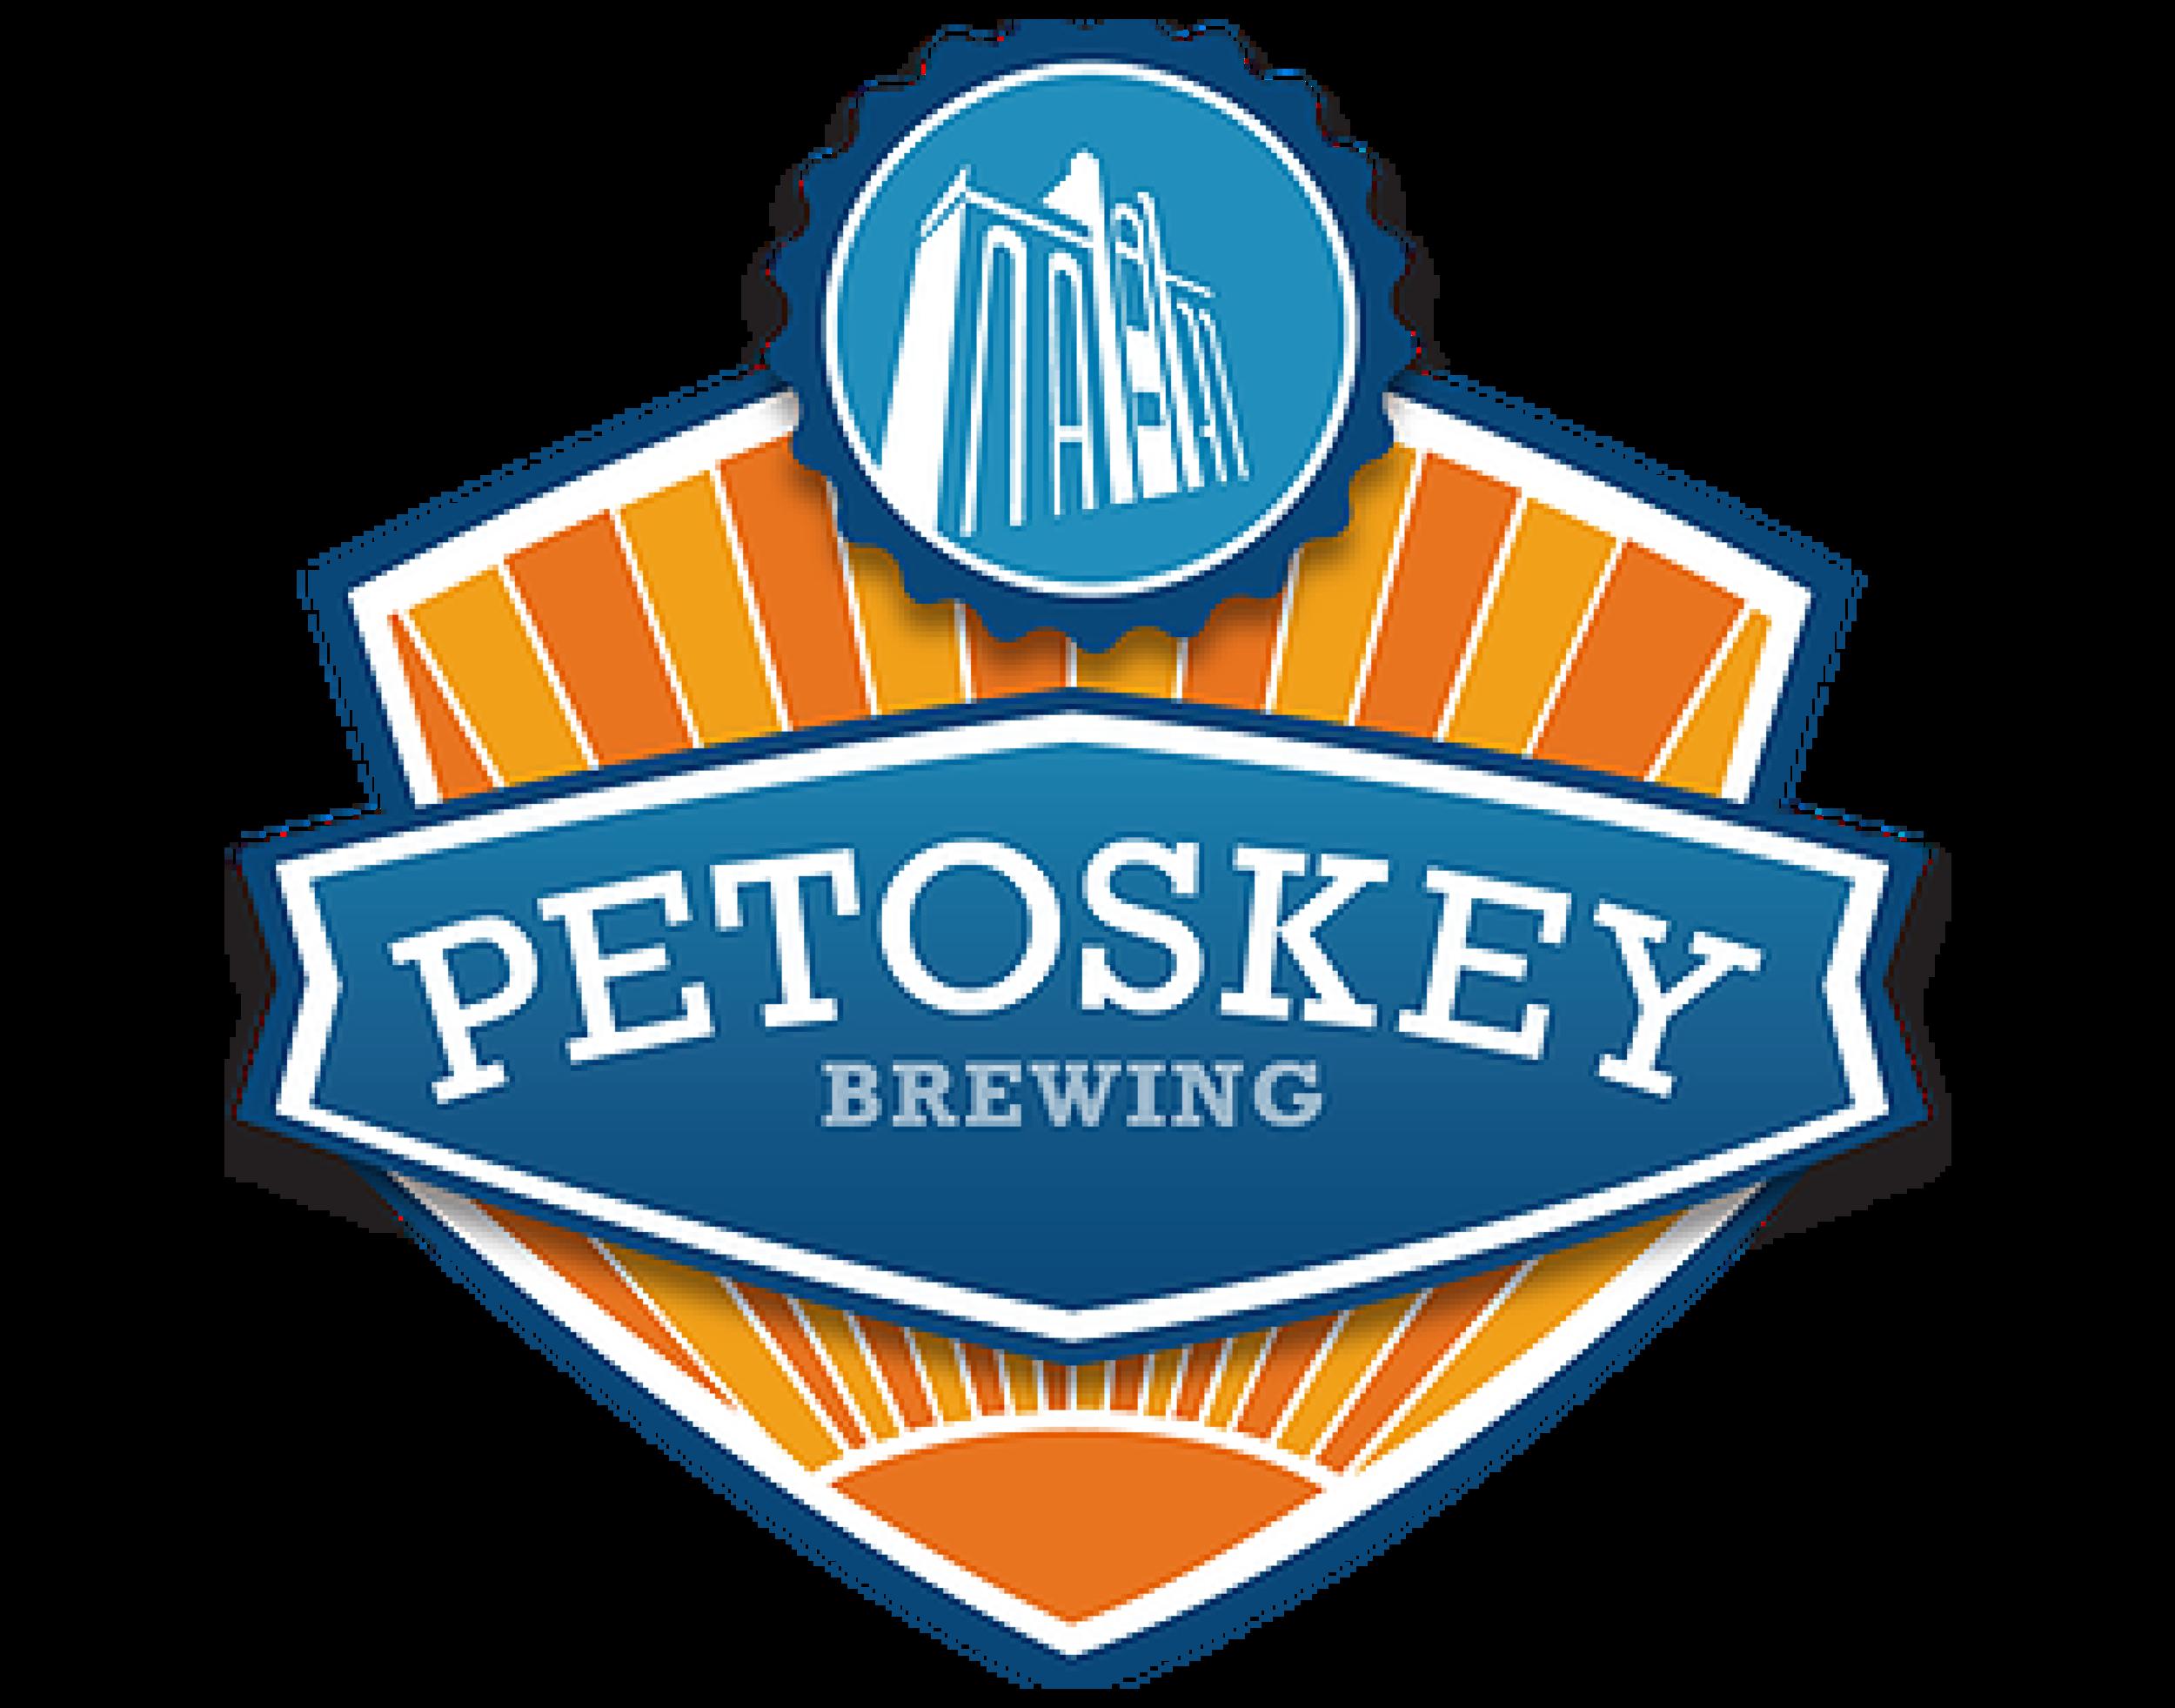 Petoskey Brewing logo. Links to Petoskey Brewing website.